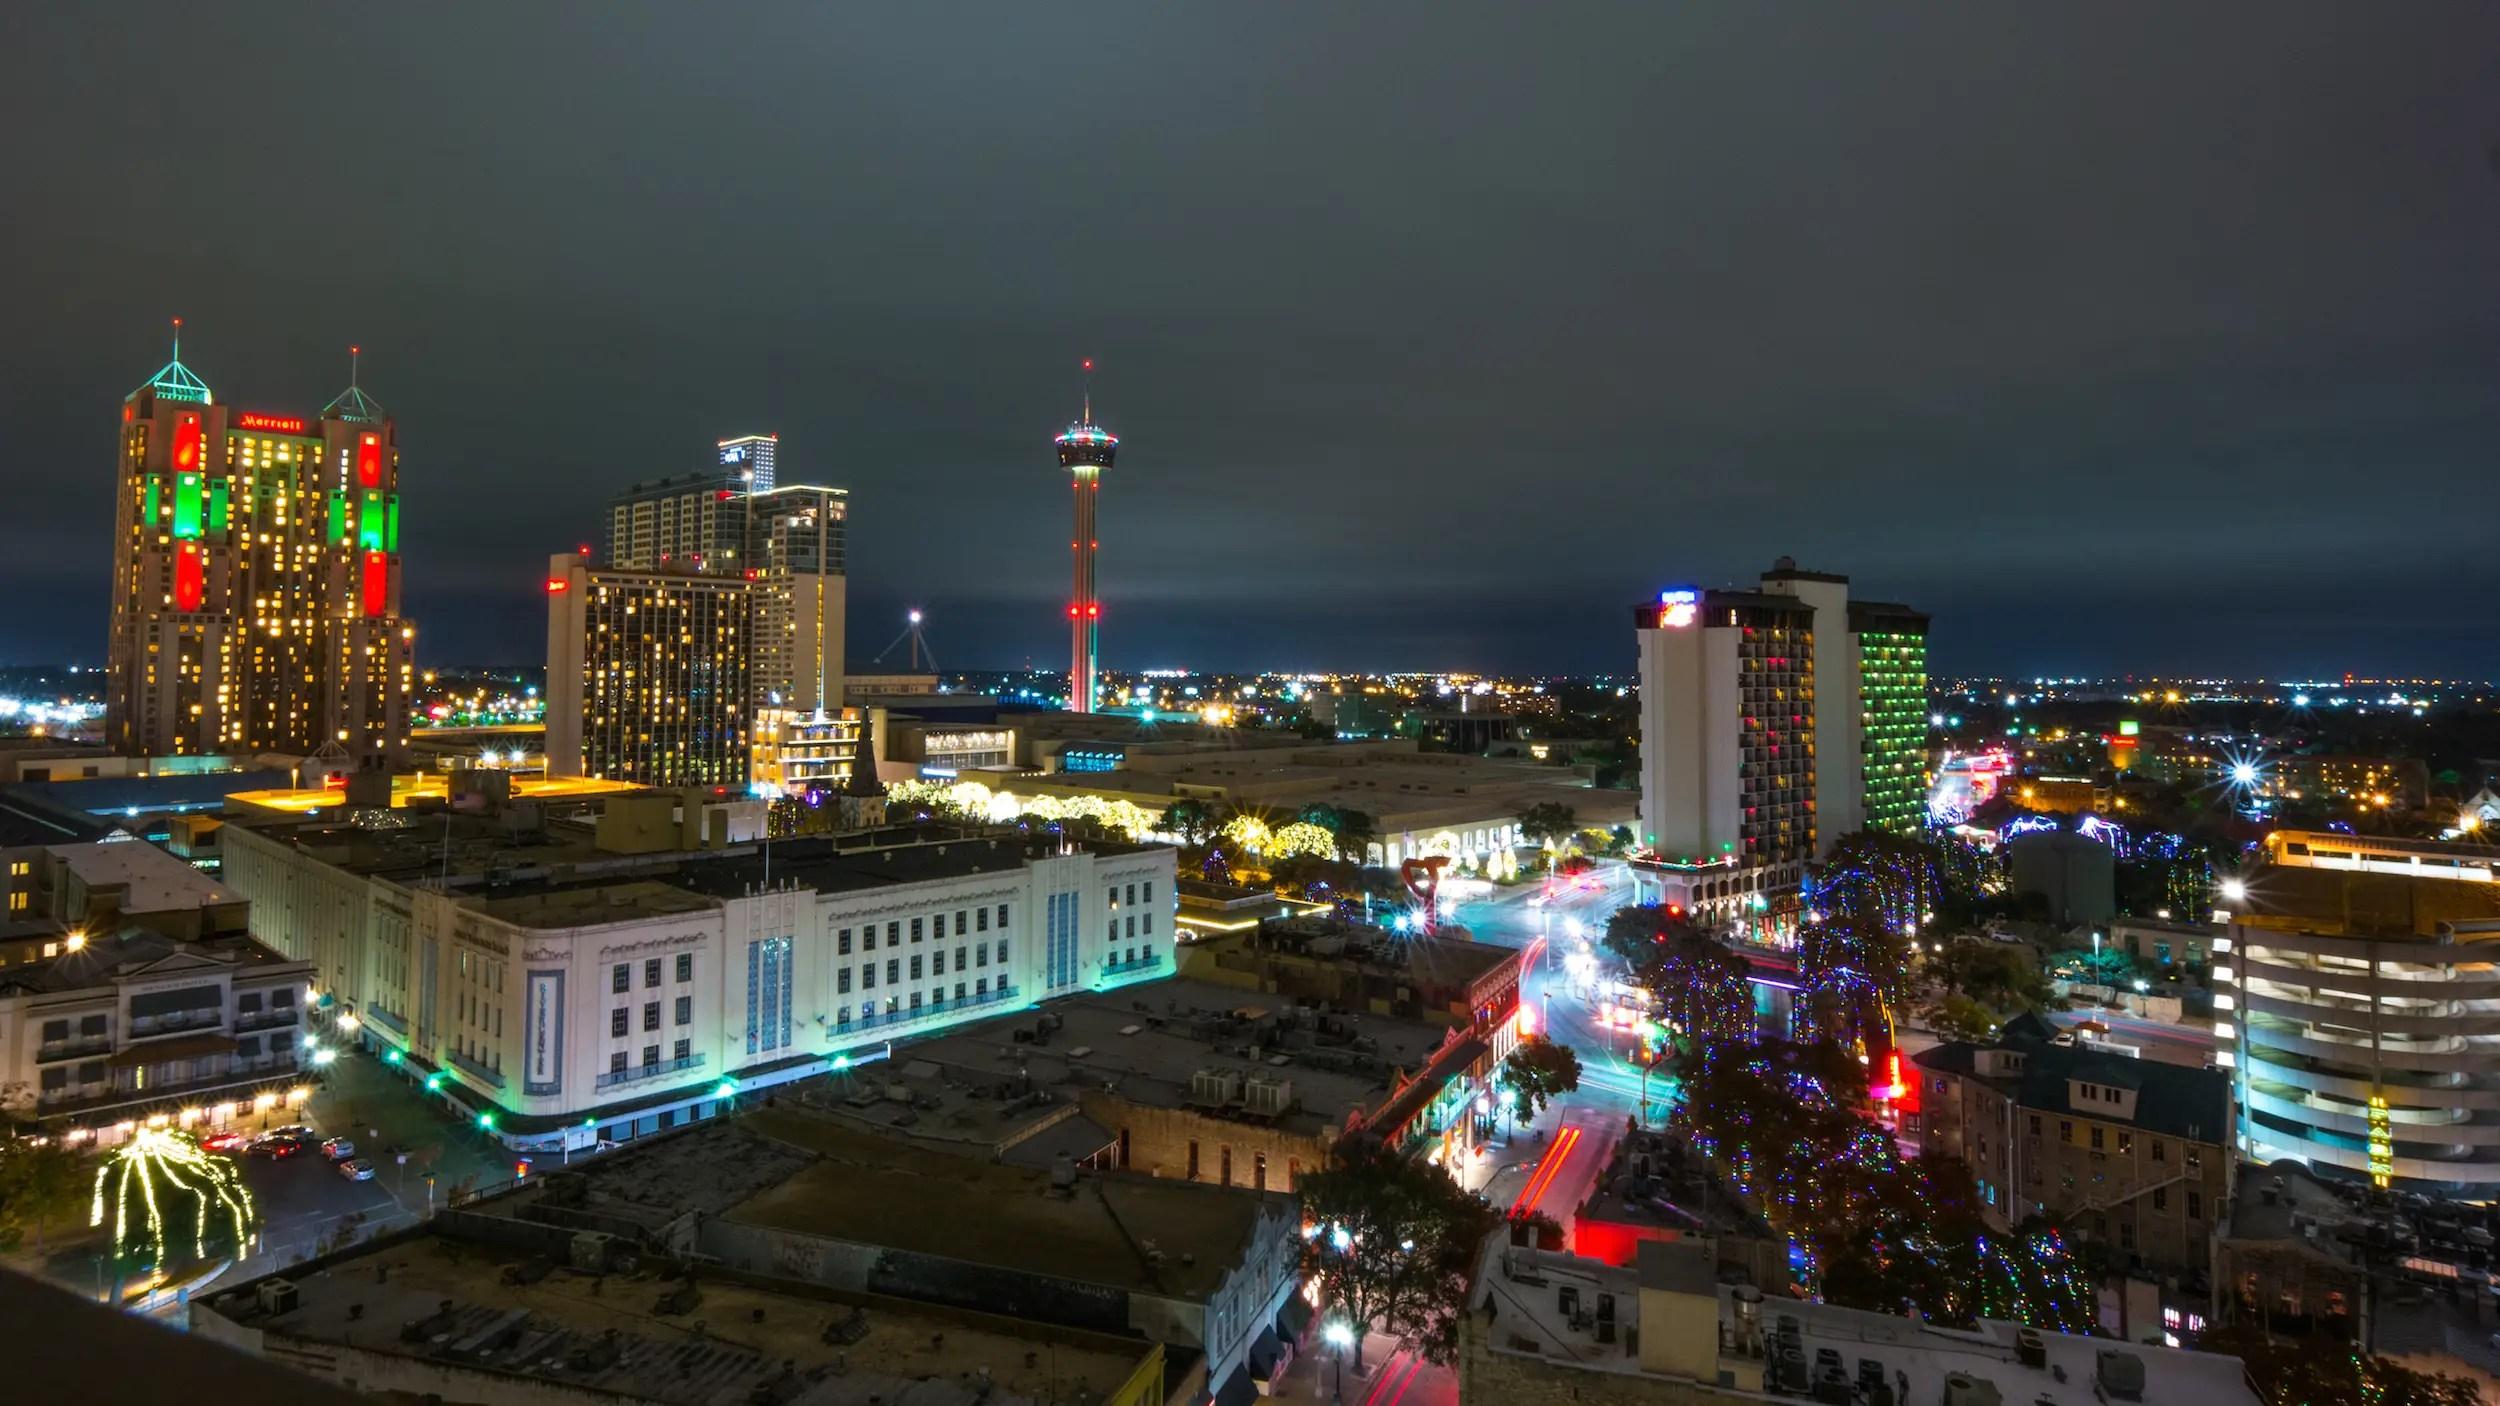 15 (tie). San Antonio, Texas: 47.01 hours